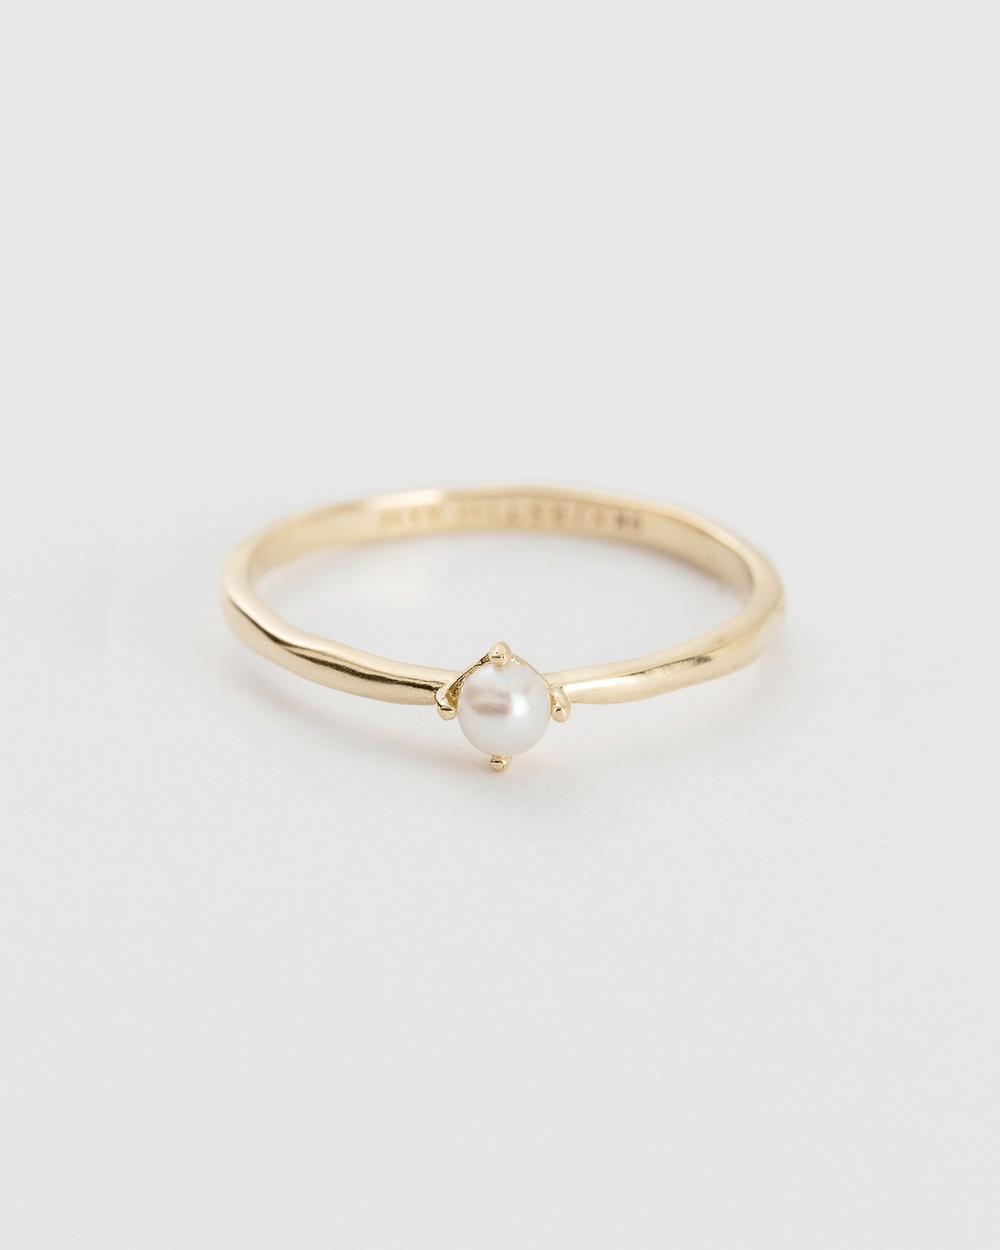 Kirstin Ash Moon Tide Pearl Ring Jewellery Gold